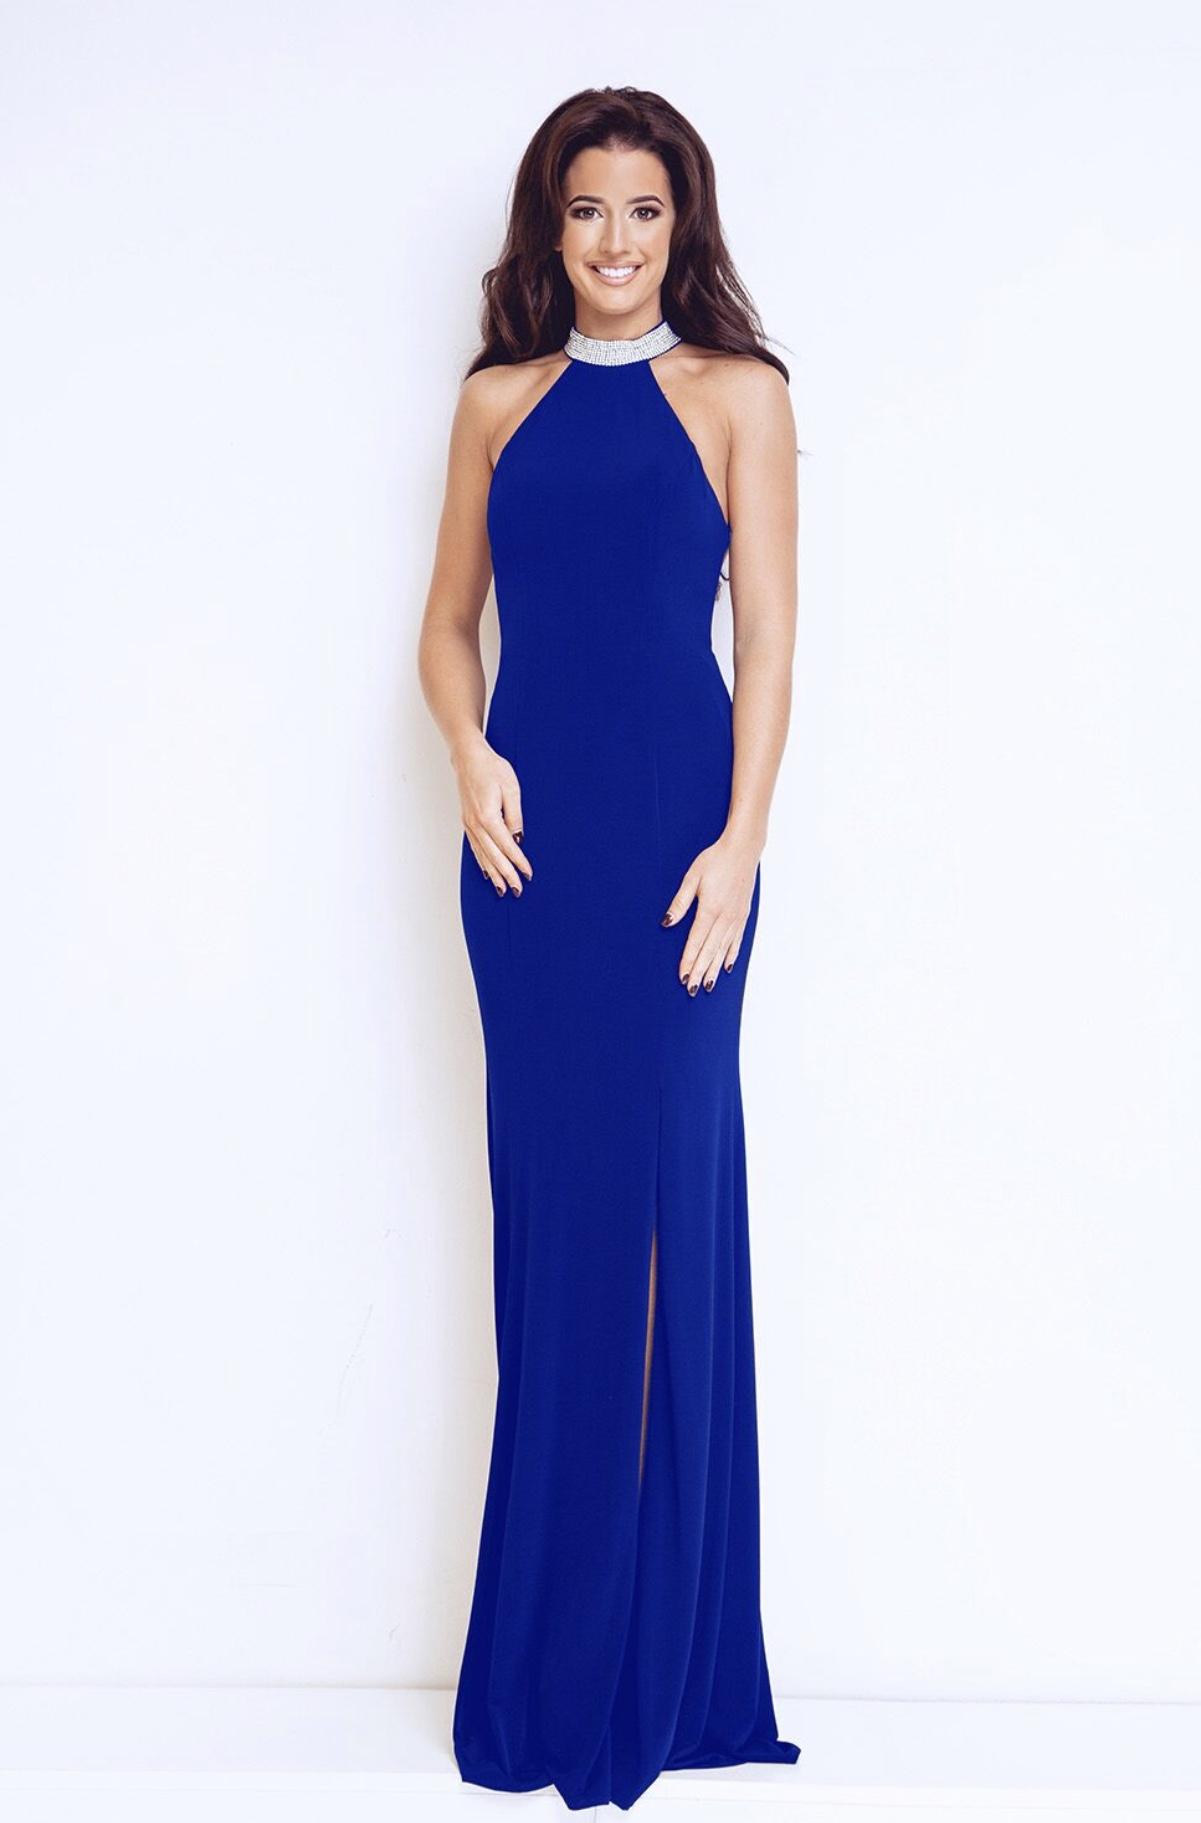 Dynasty London 1013127 royal blue - Ladida Boutique c64a9903c